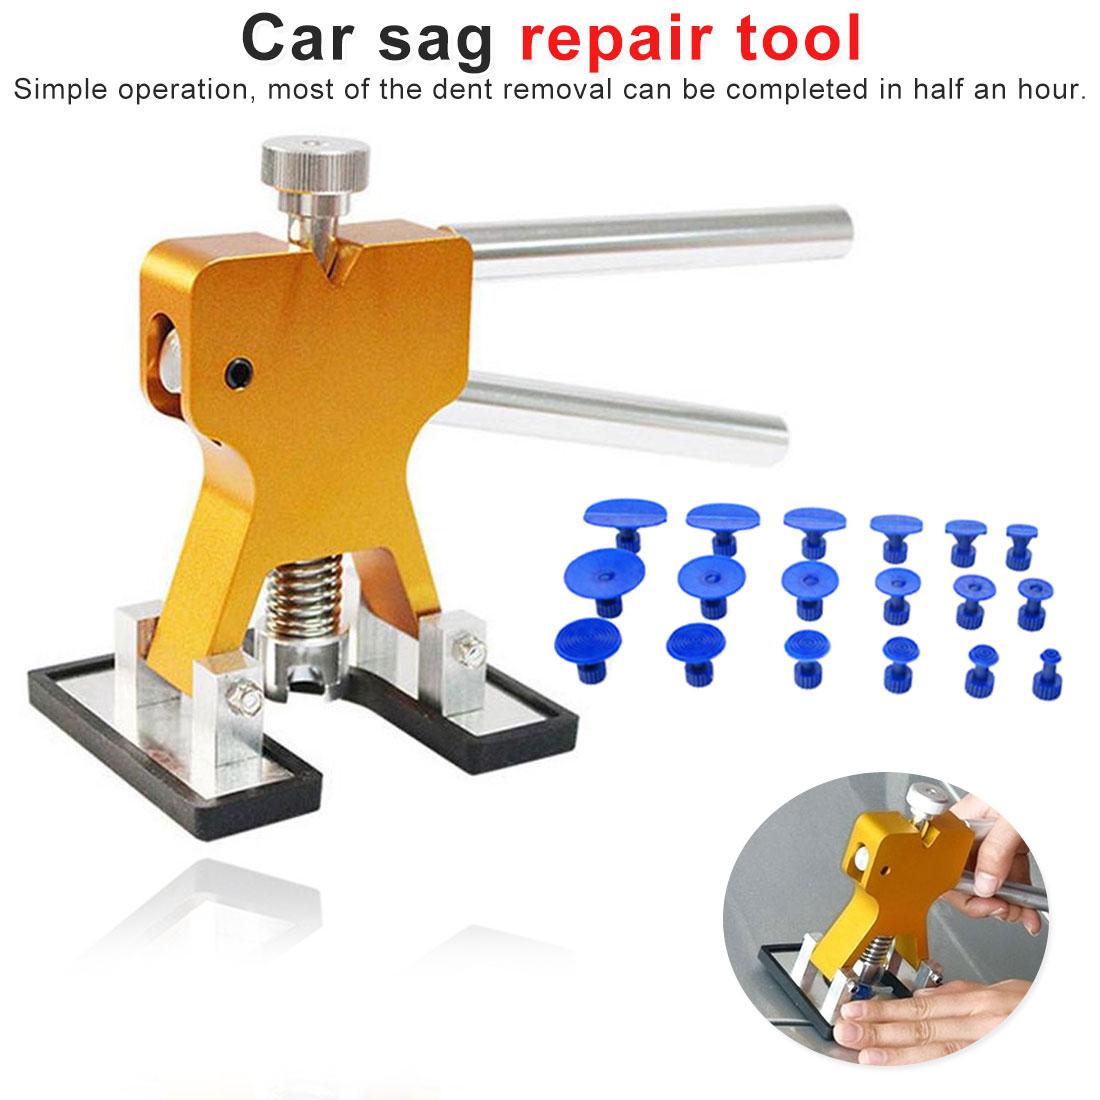 Car Body Paintless Dent Puller Lifter Repair Tool  18 Tabs Car Dent Remover Car Dent Repair Tools Cars Tool Kit Hand Tool Sets